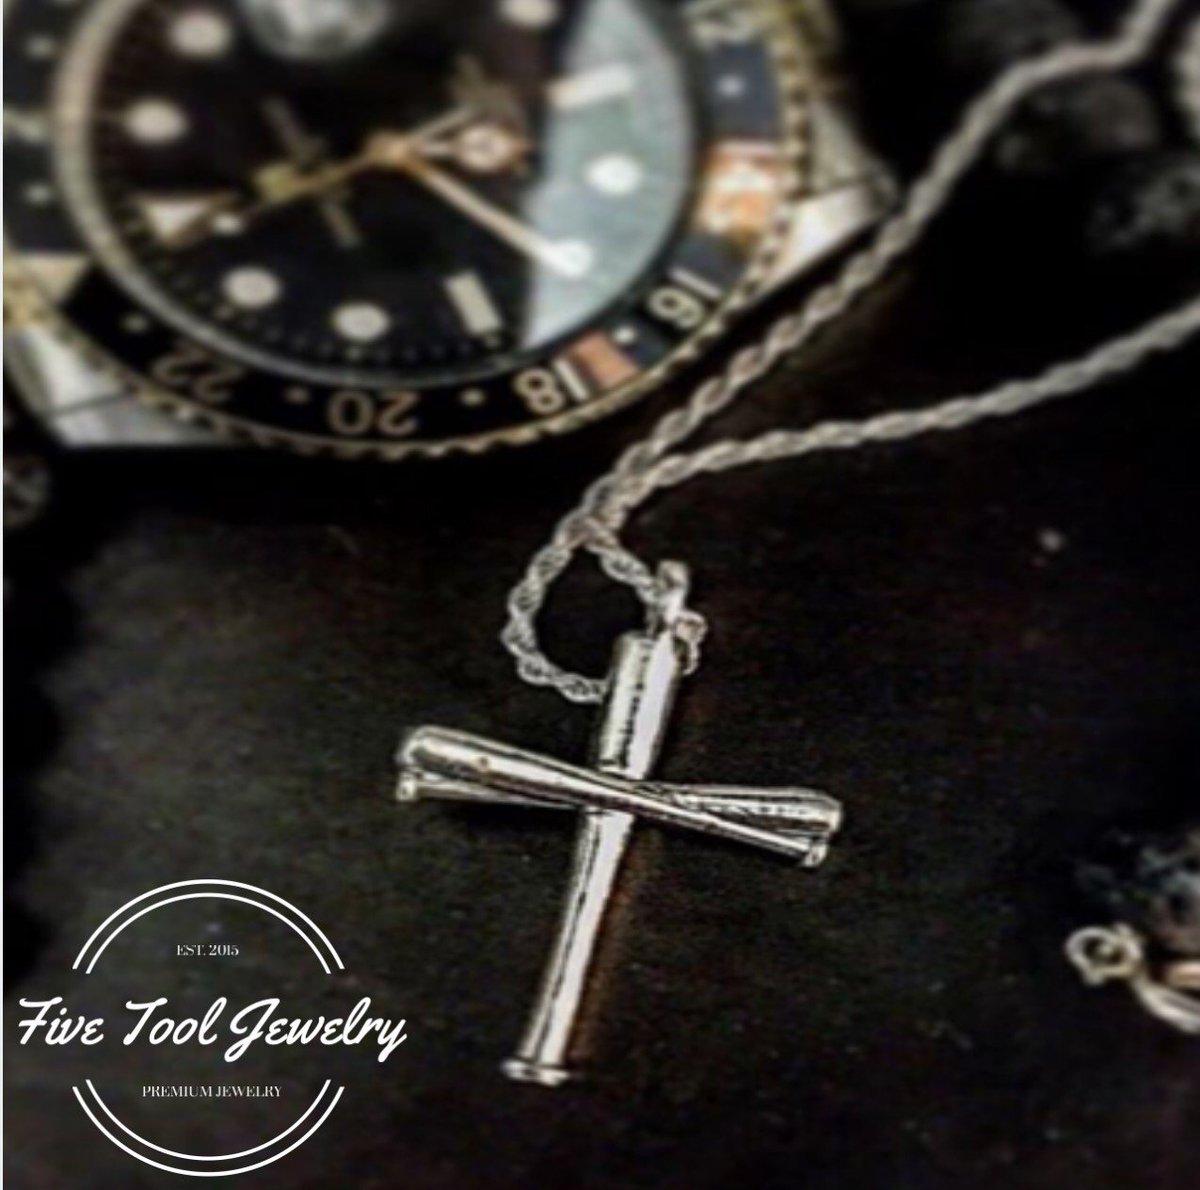 five tool jewelry (@fivetooljewelry) | twitter